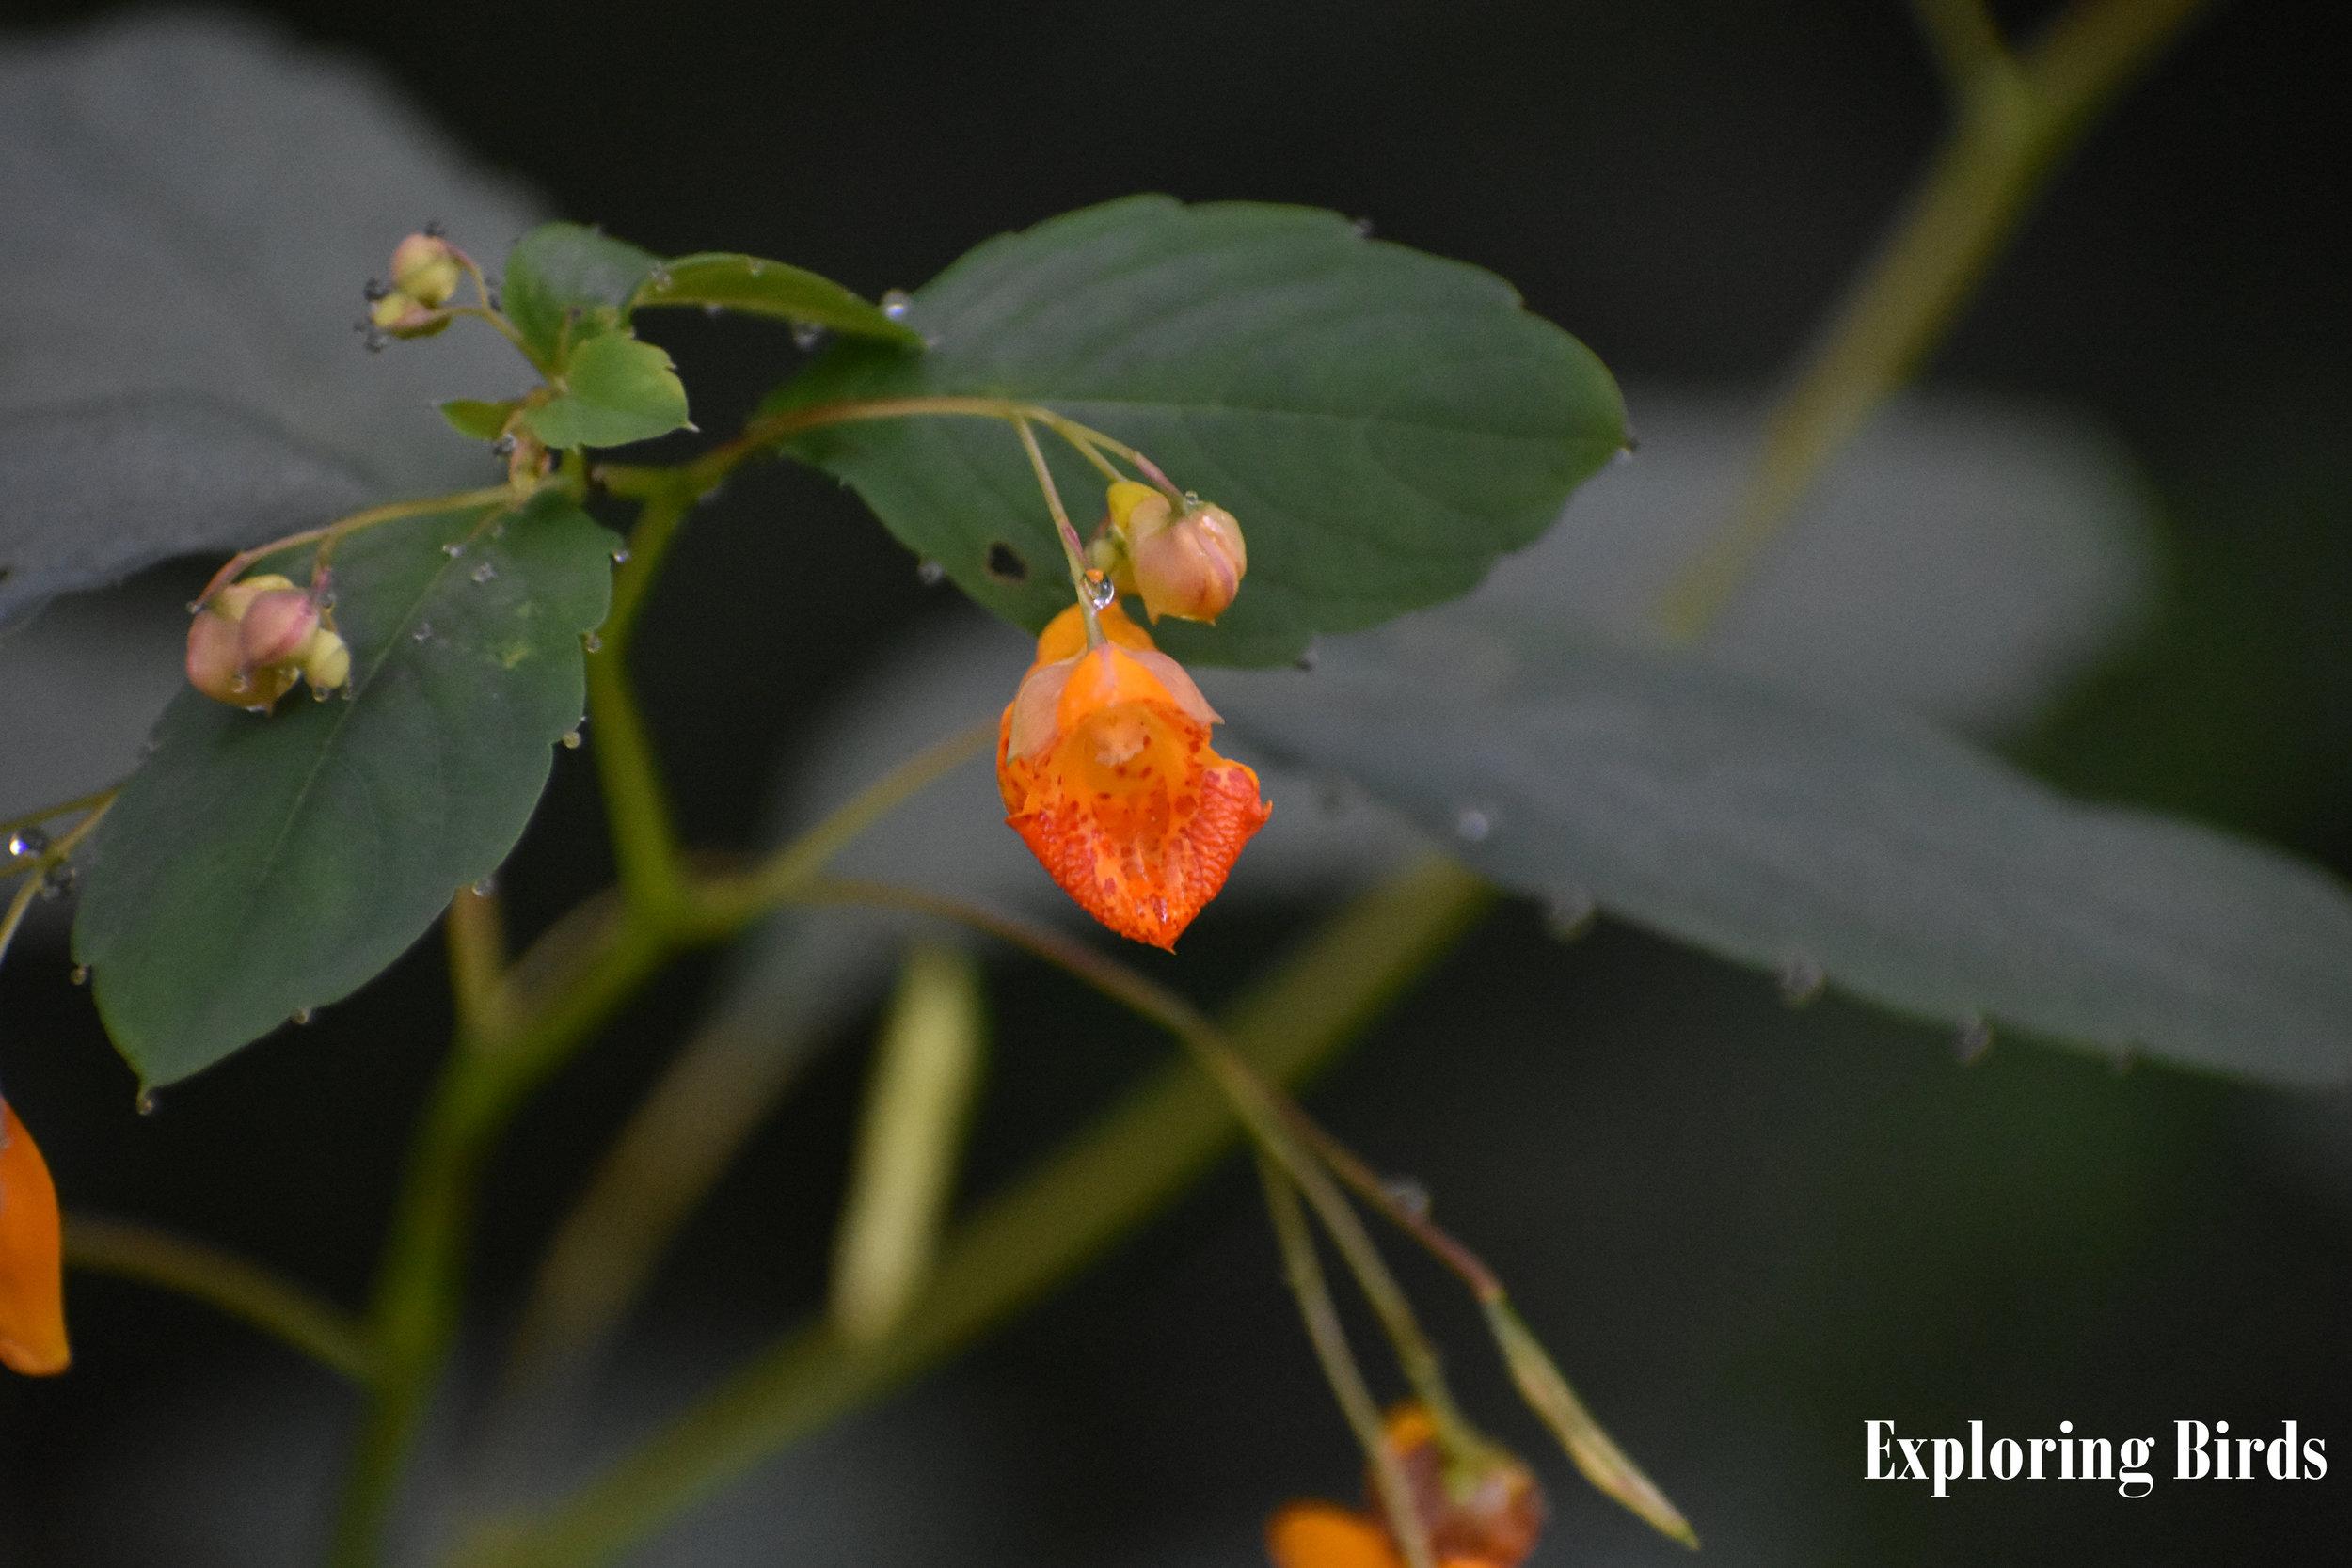 Jewelweed attracts hummingbirds